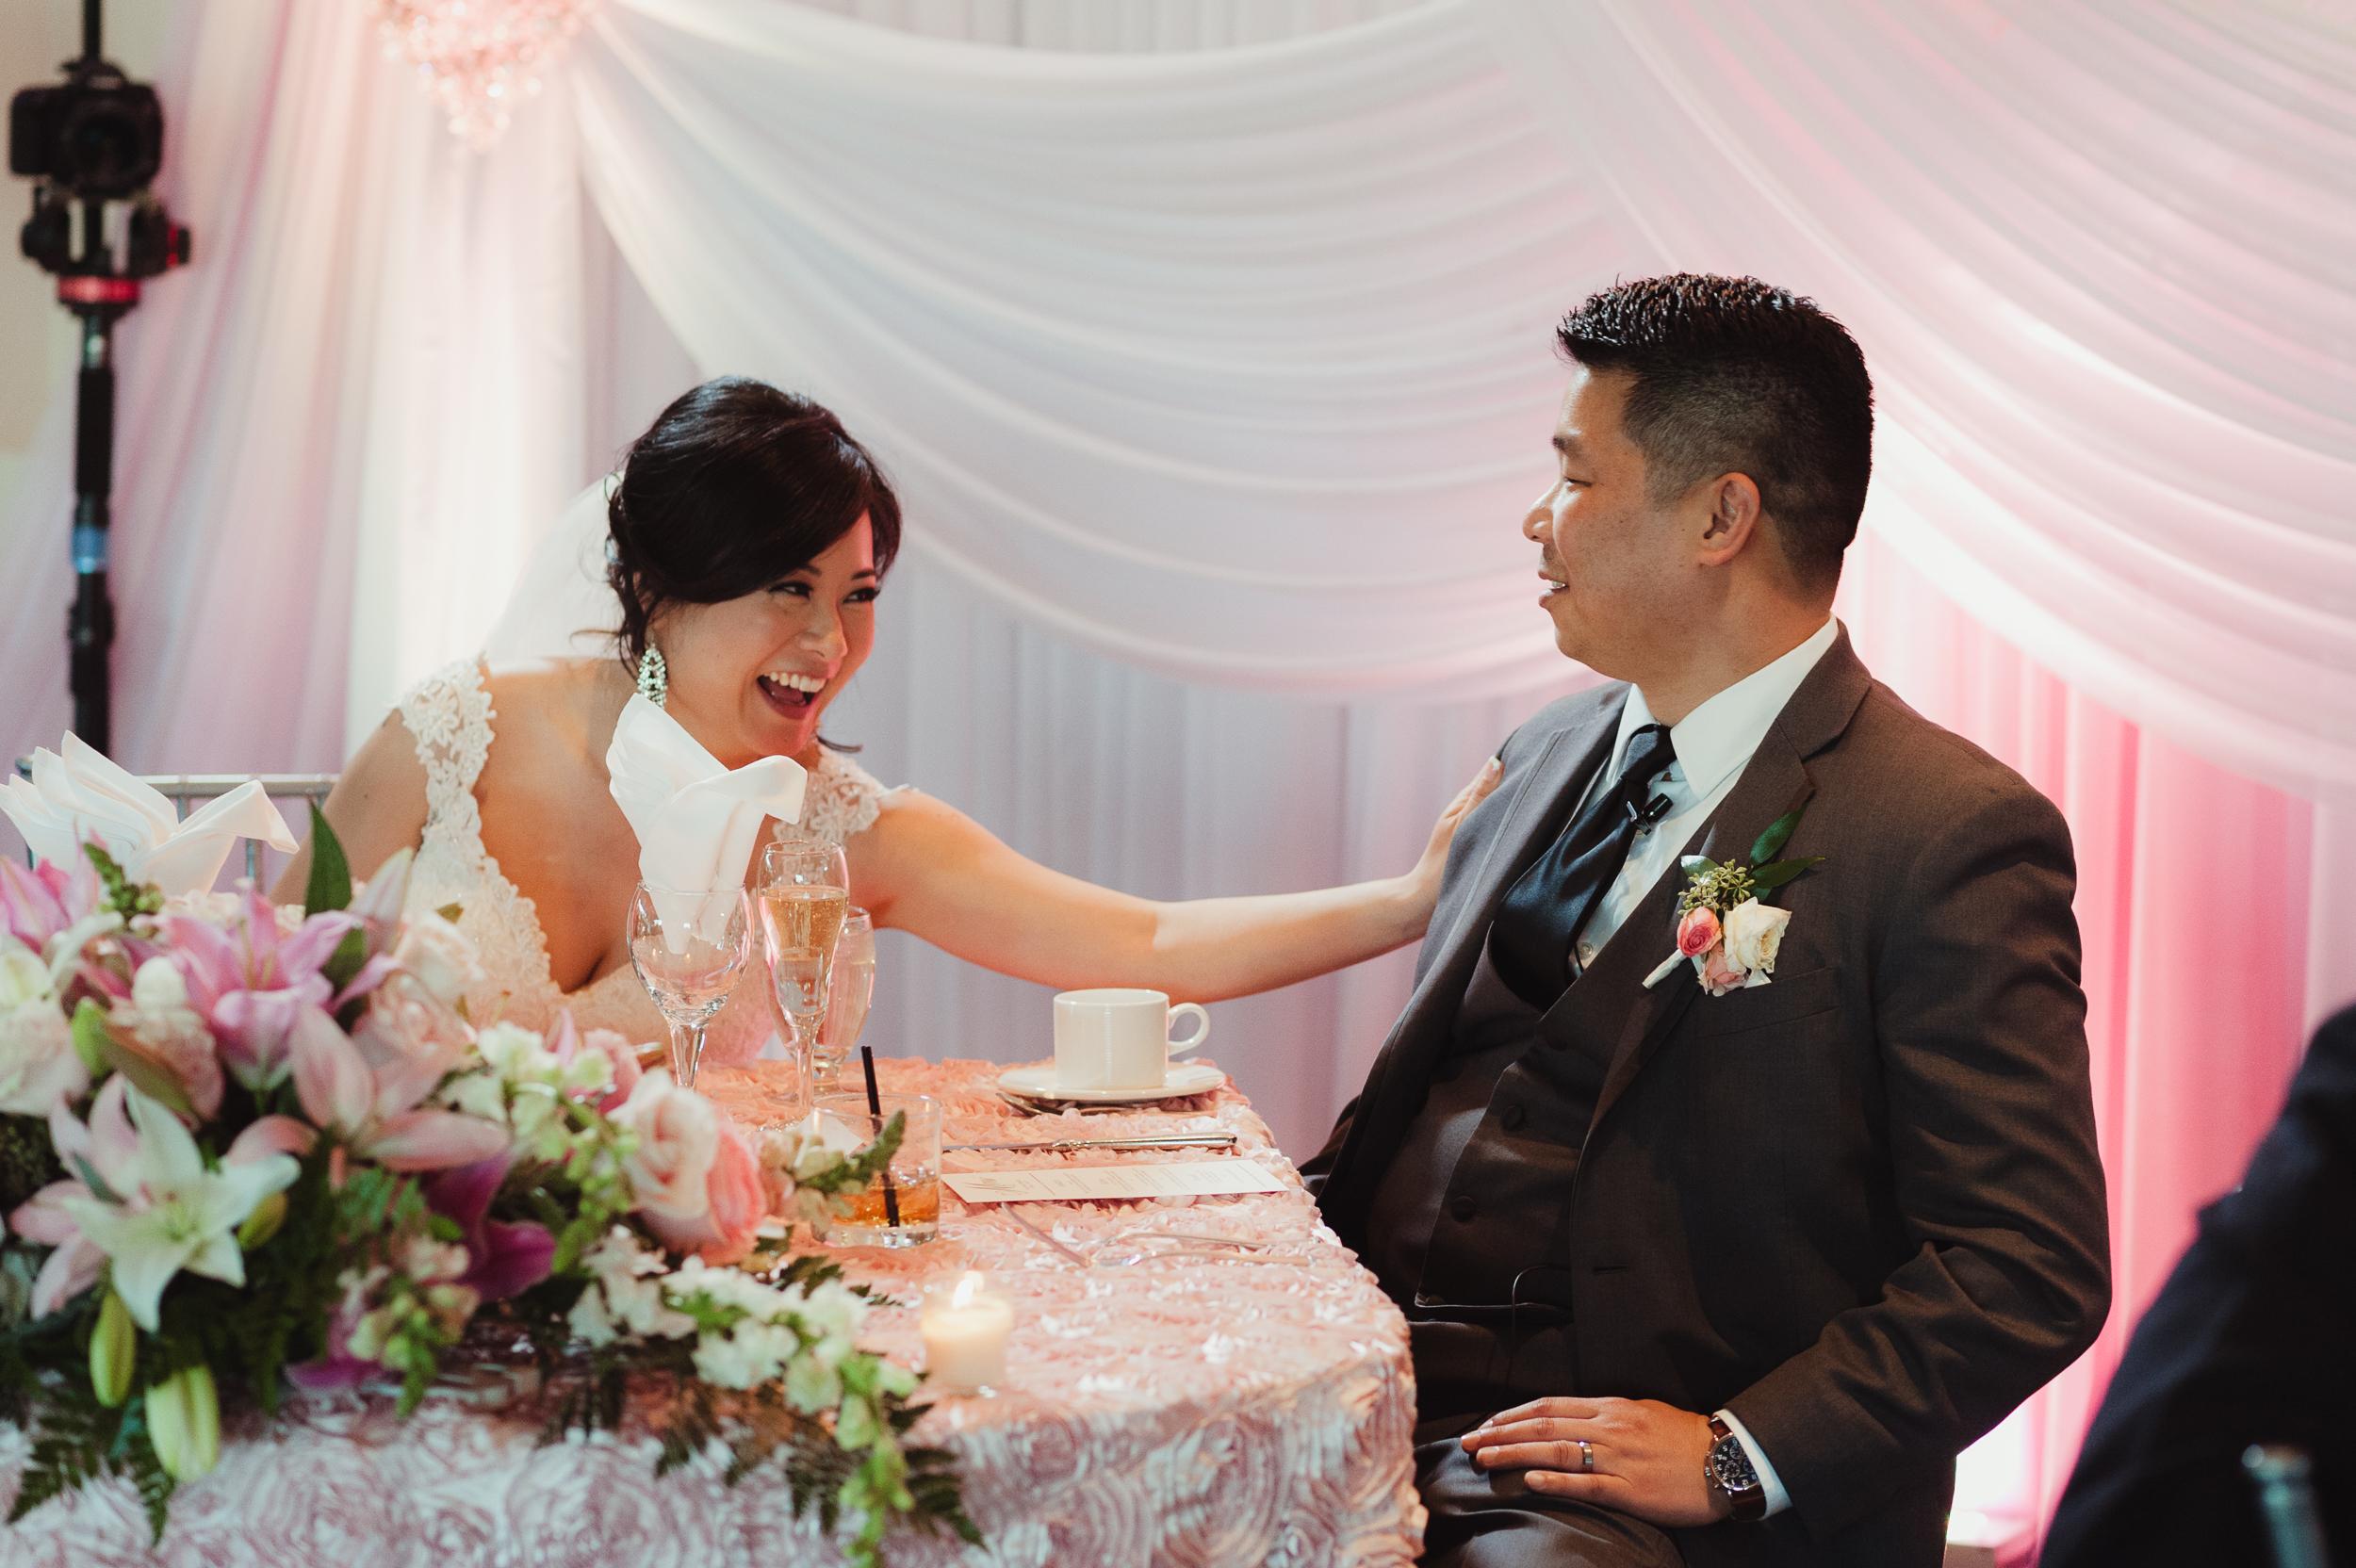 32-saratoga-country-club-wedding-vivianchen-558.jpg